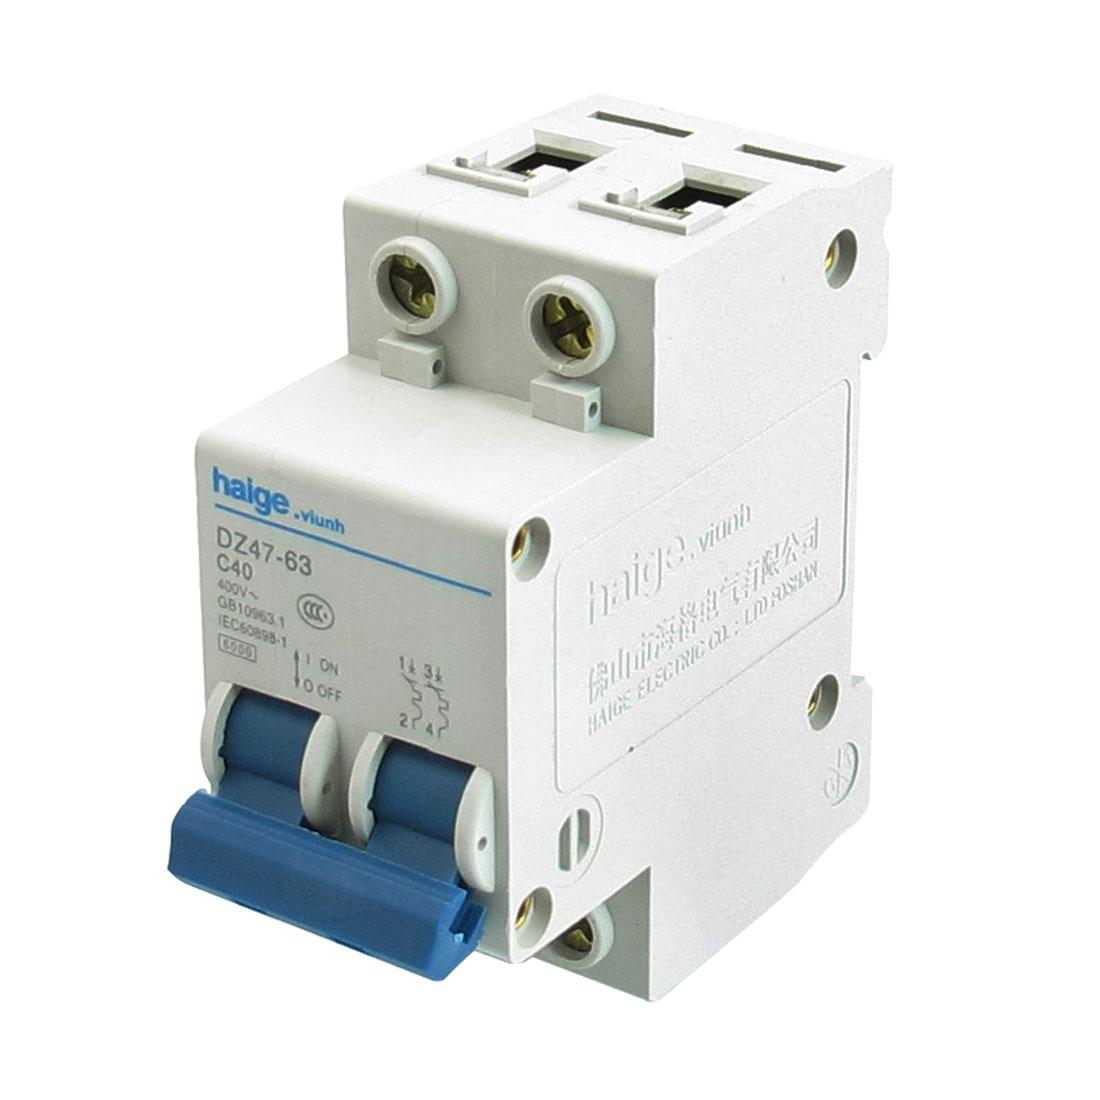 AC 400V 40A 6000A 2 P MCB Miniature Circuit Breaker DZ47-63 C40